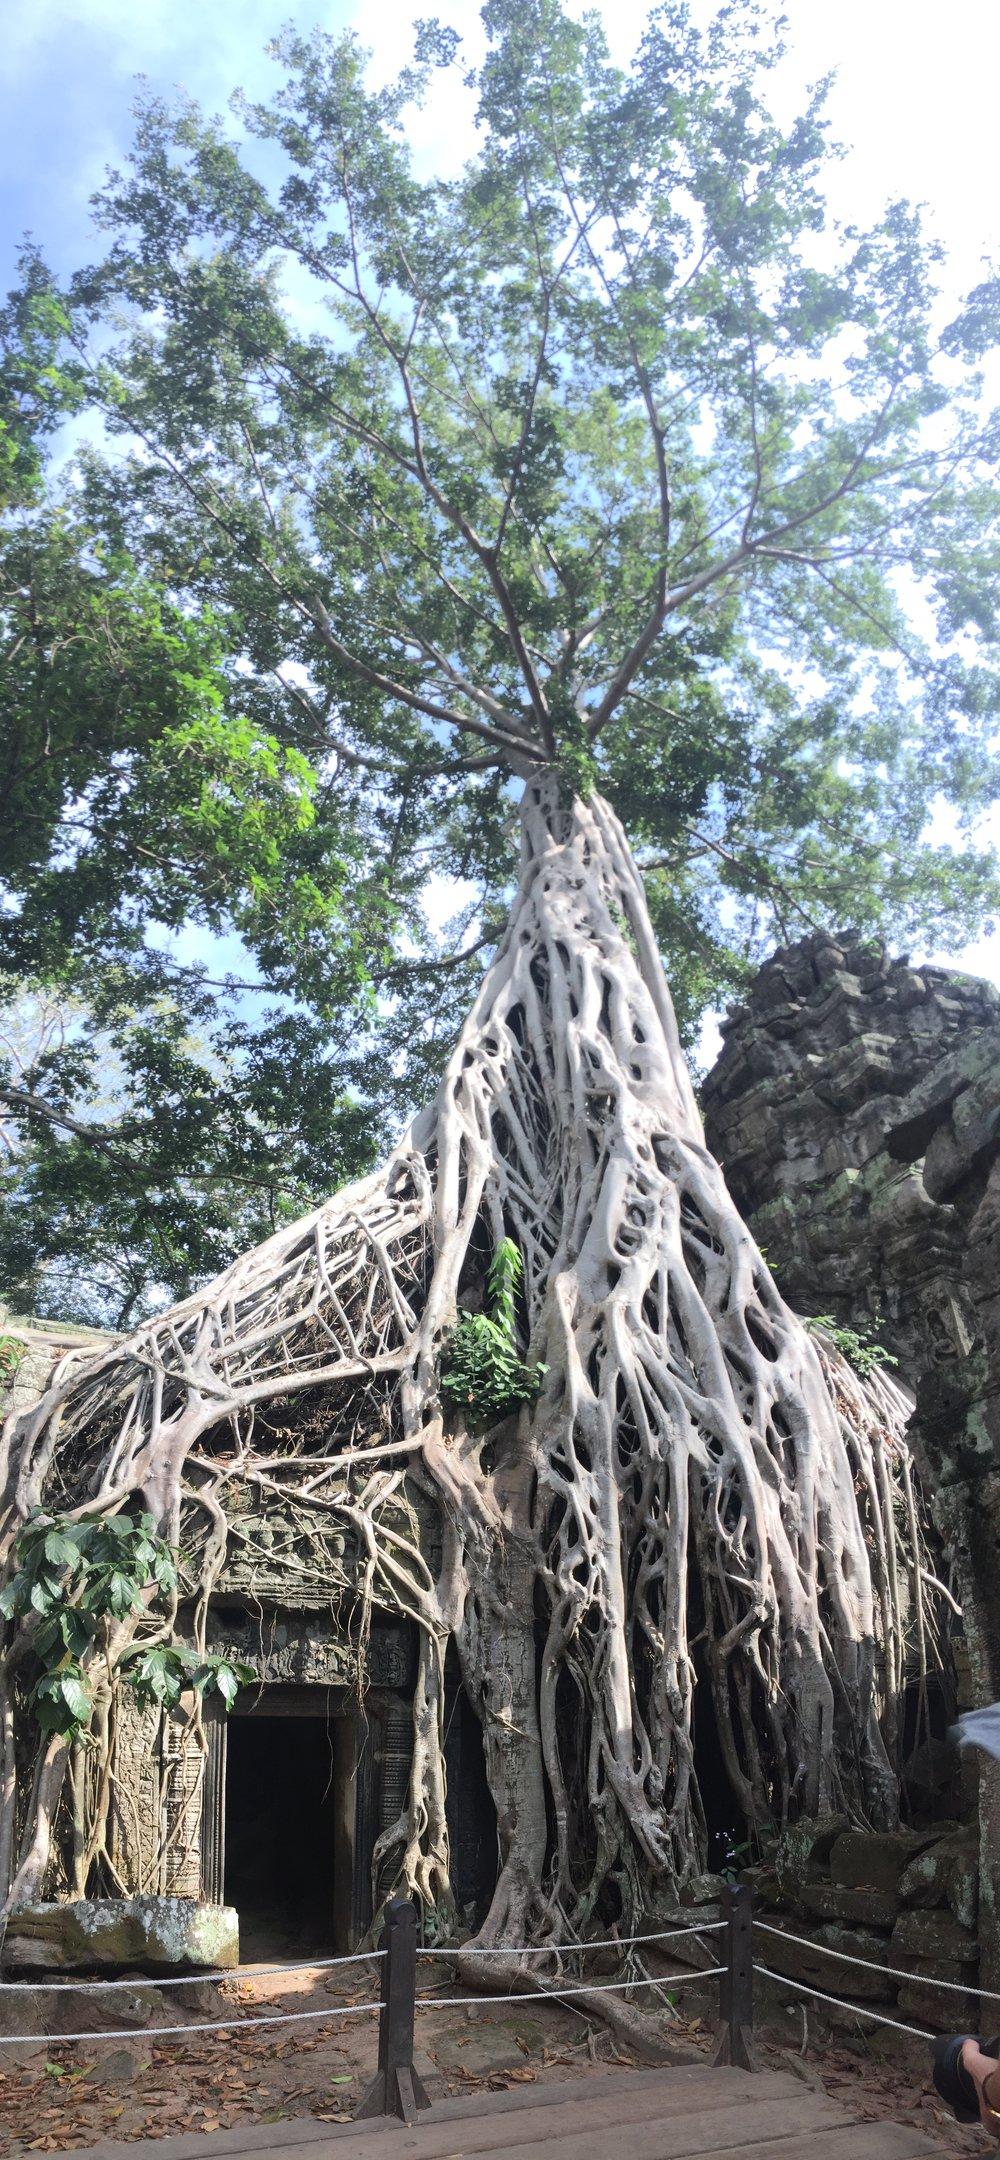 A tree strangling Ta Prohm Temple. Fun fact: A scene in Tomb Raider was filmed here.